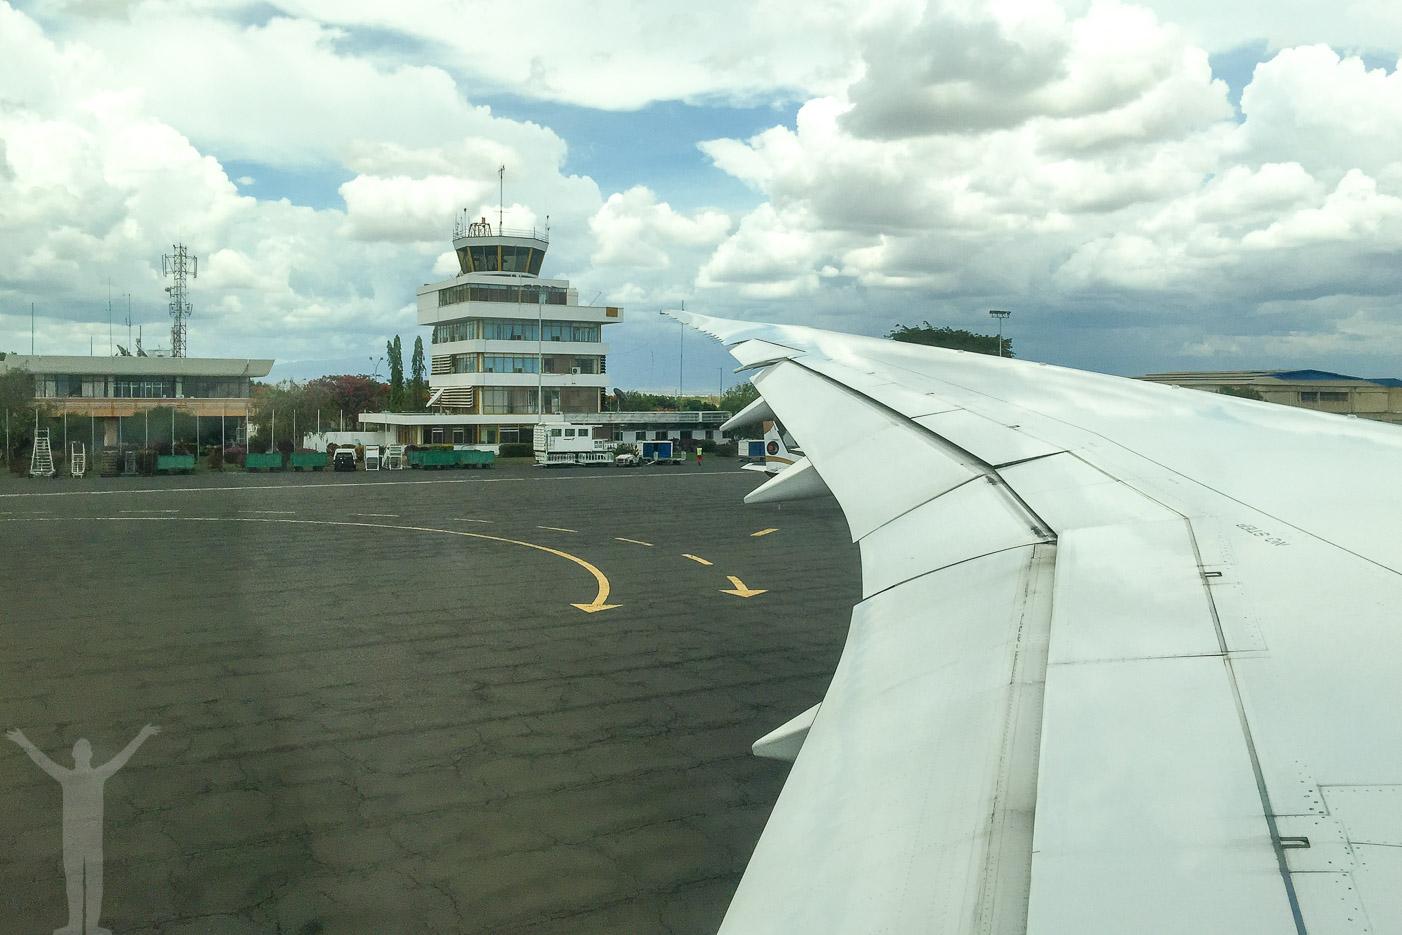 Kilimanjaro Airport, JRO